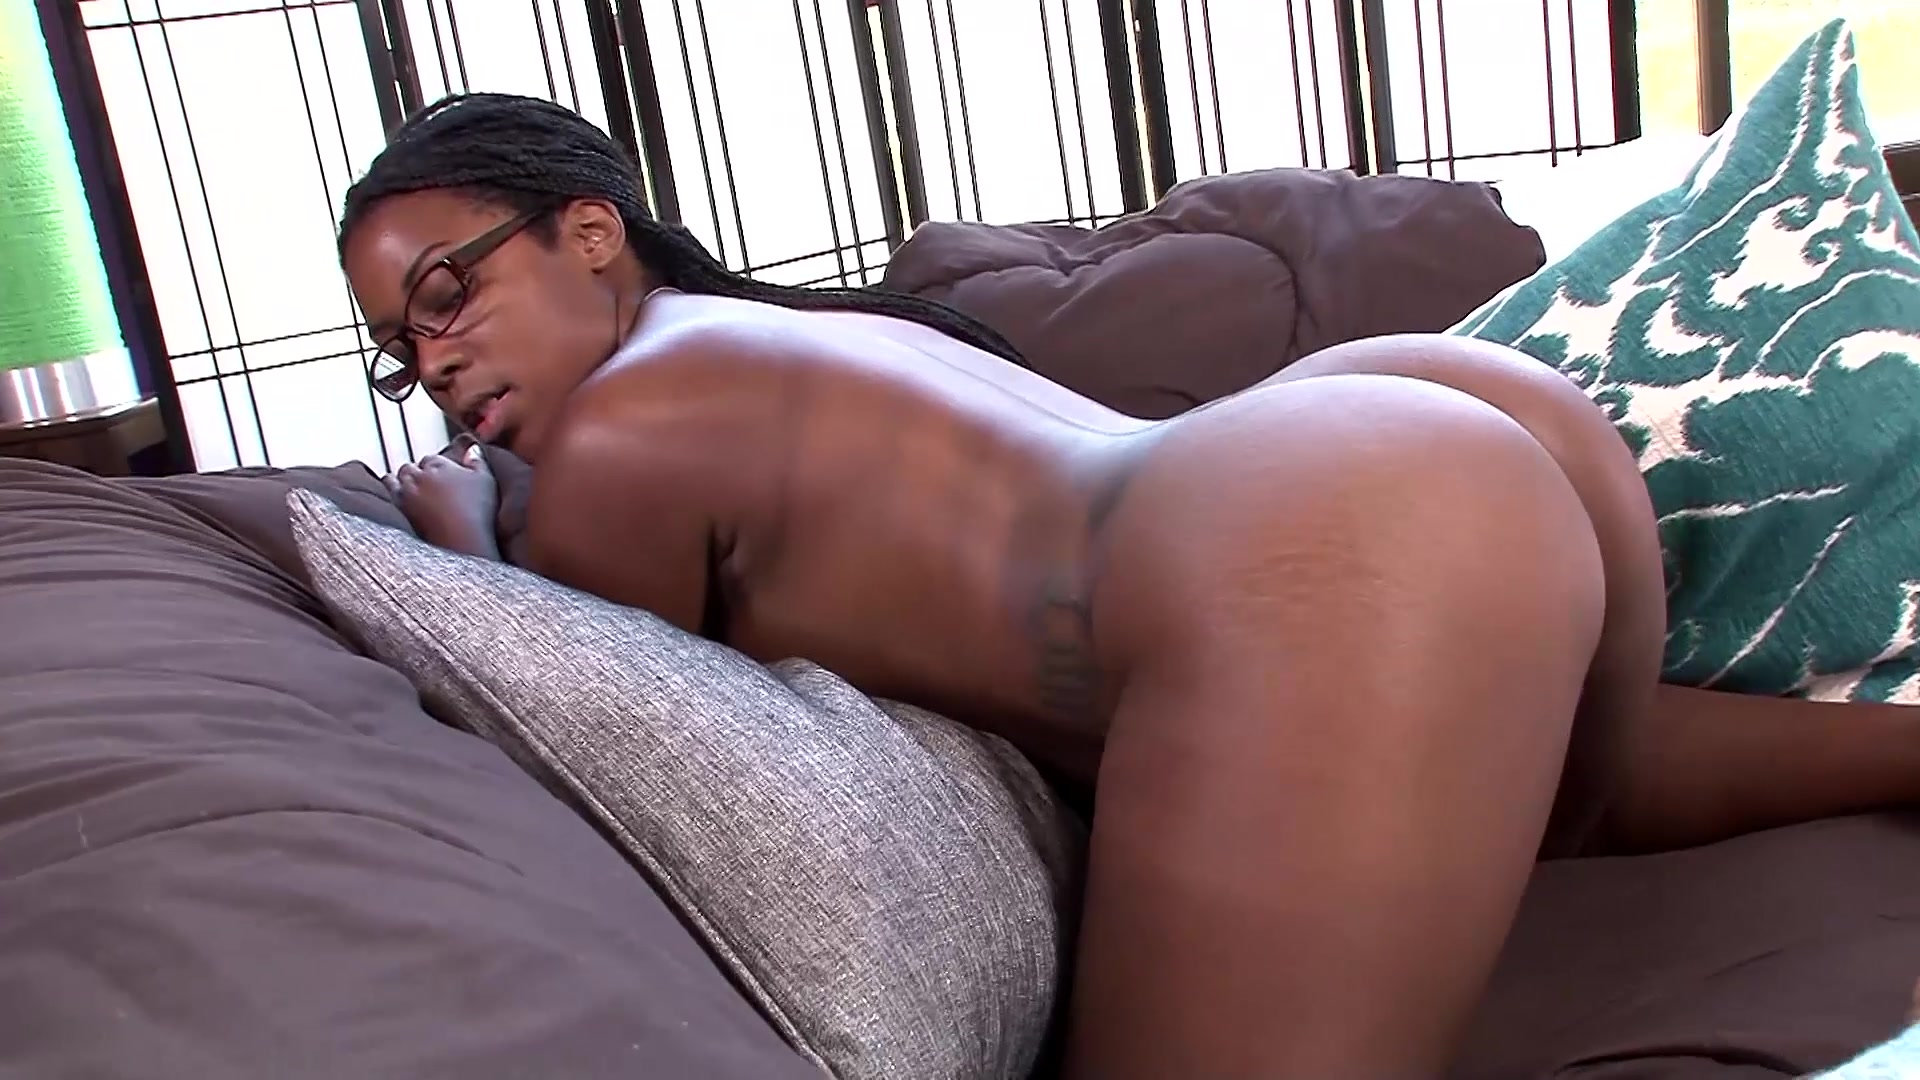 Amateur perverted porn